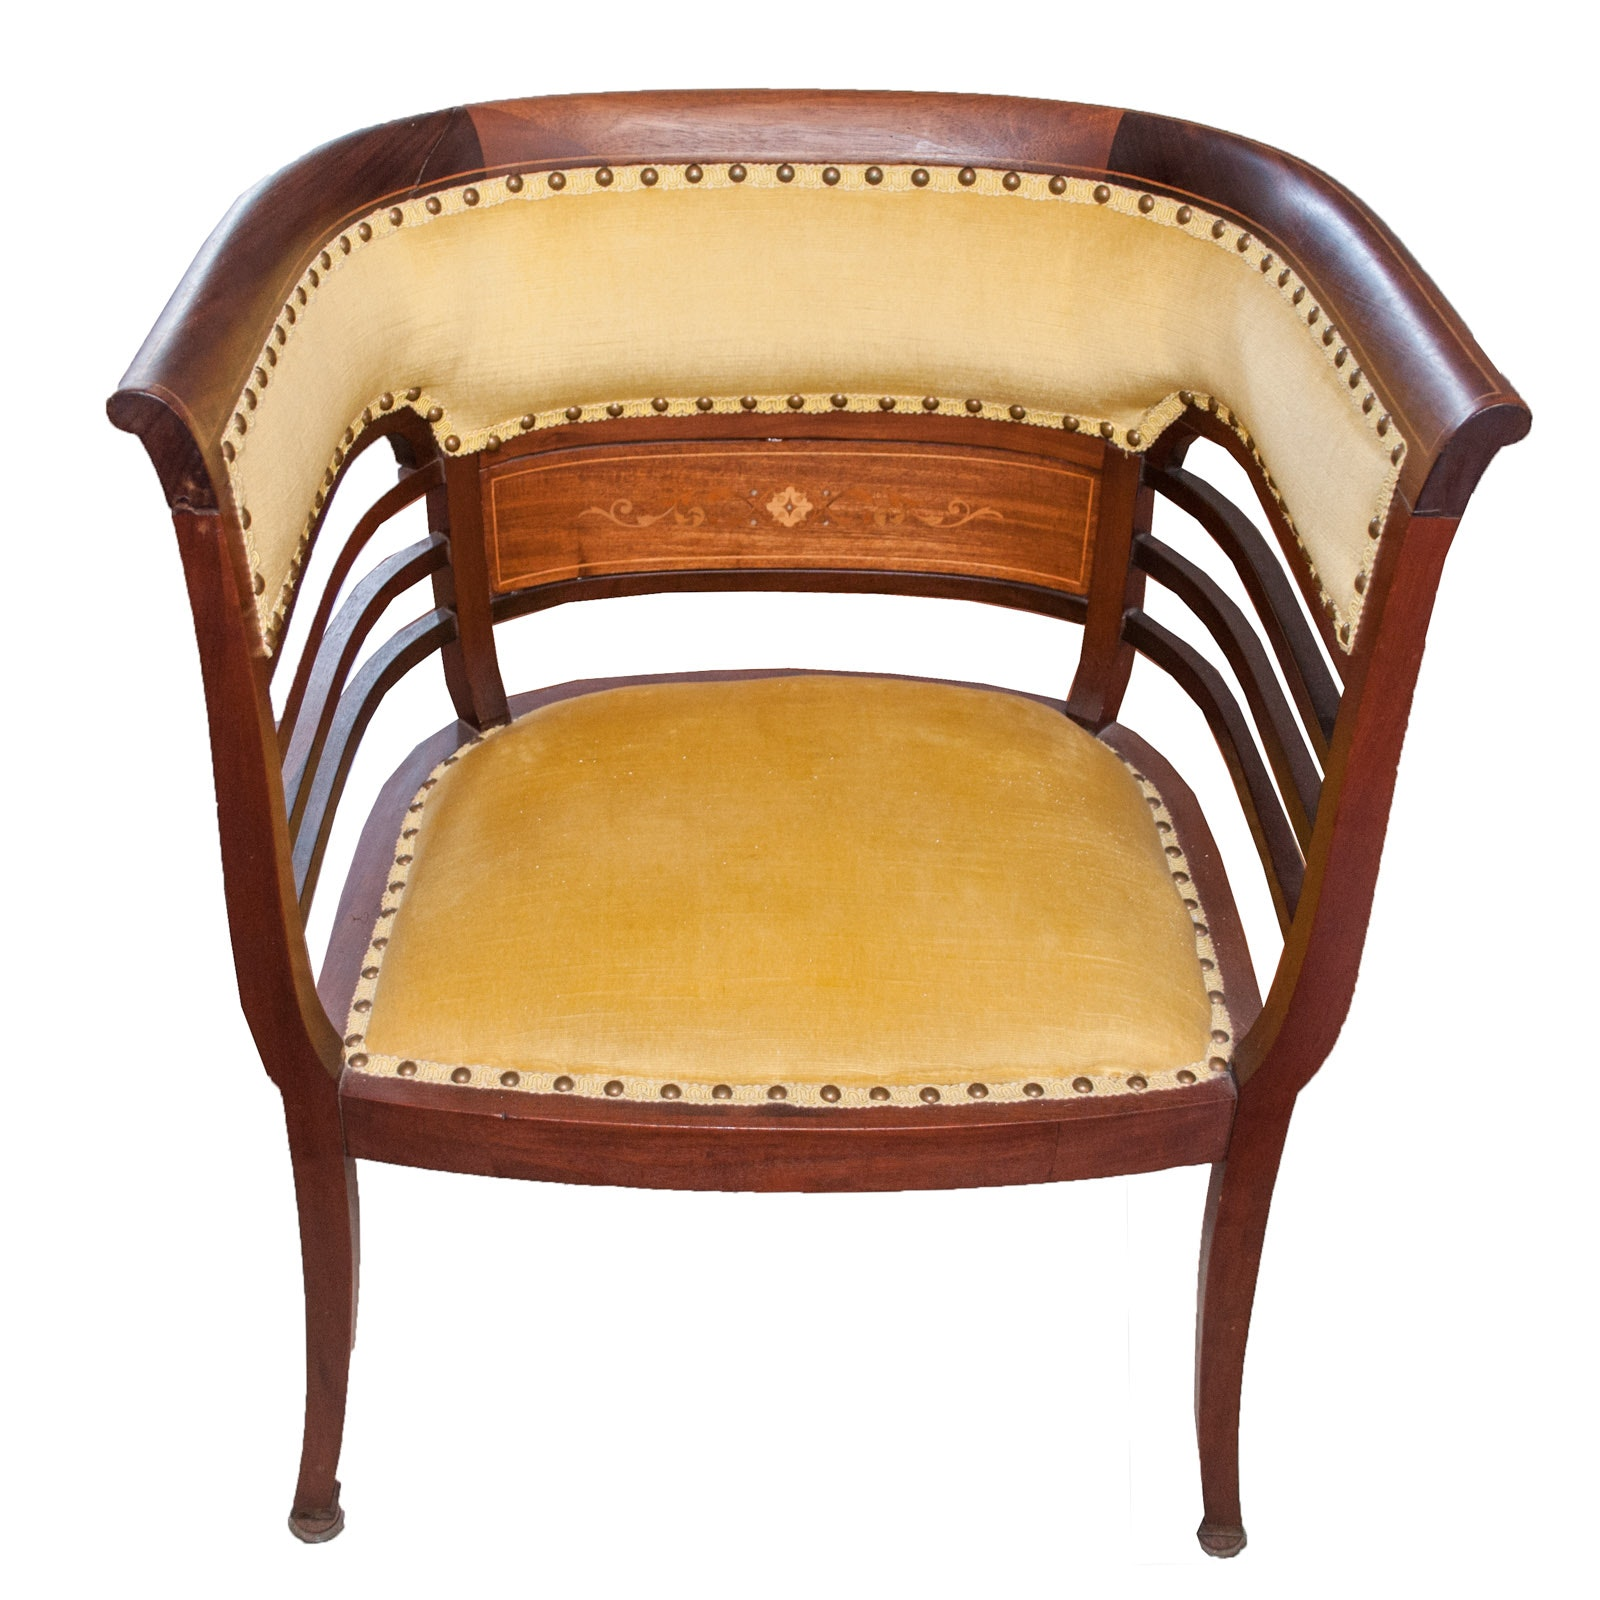 Antique Wood and Velvet Barrel Back Chair